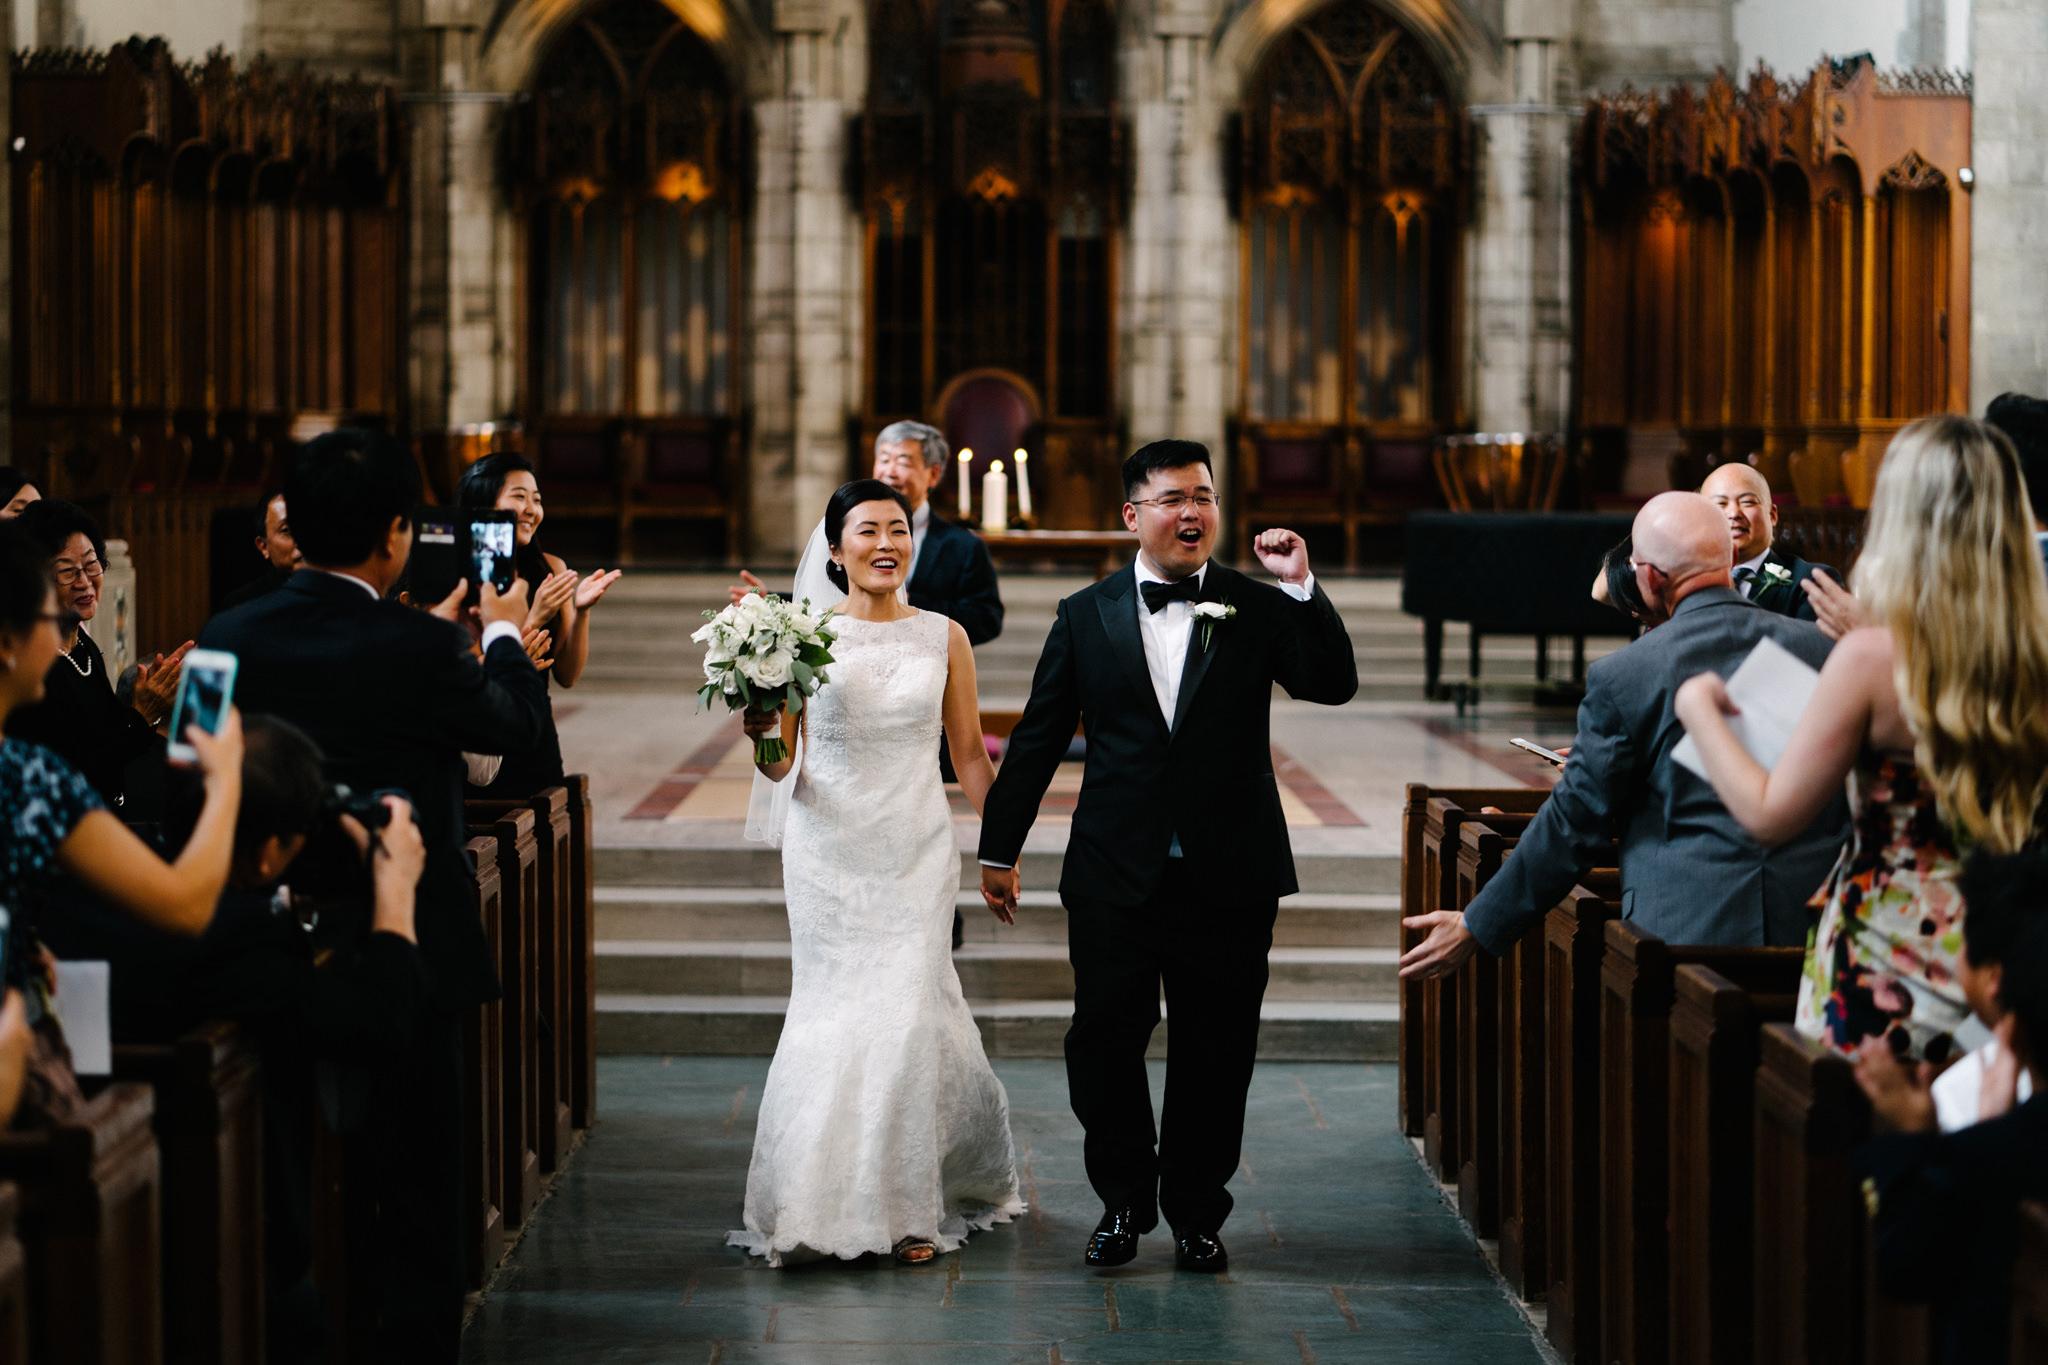 028-rempel-photography-chicago-wedding-inspiration-sara-philip-rockefeller-chapel-trump-tower.jpg